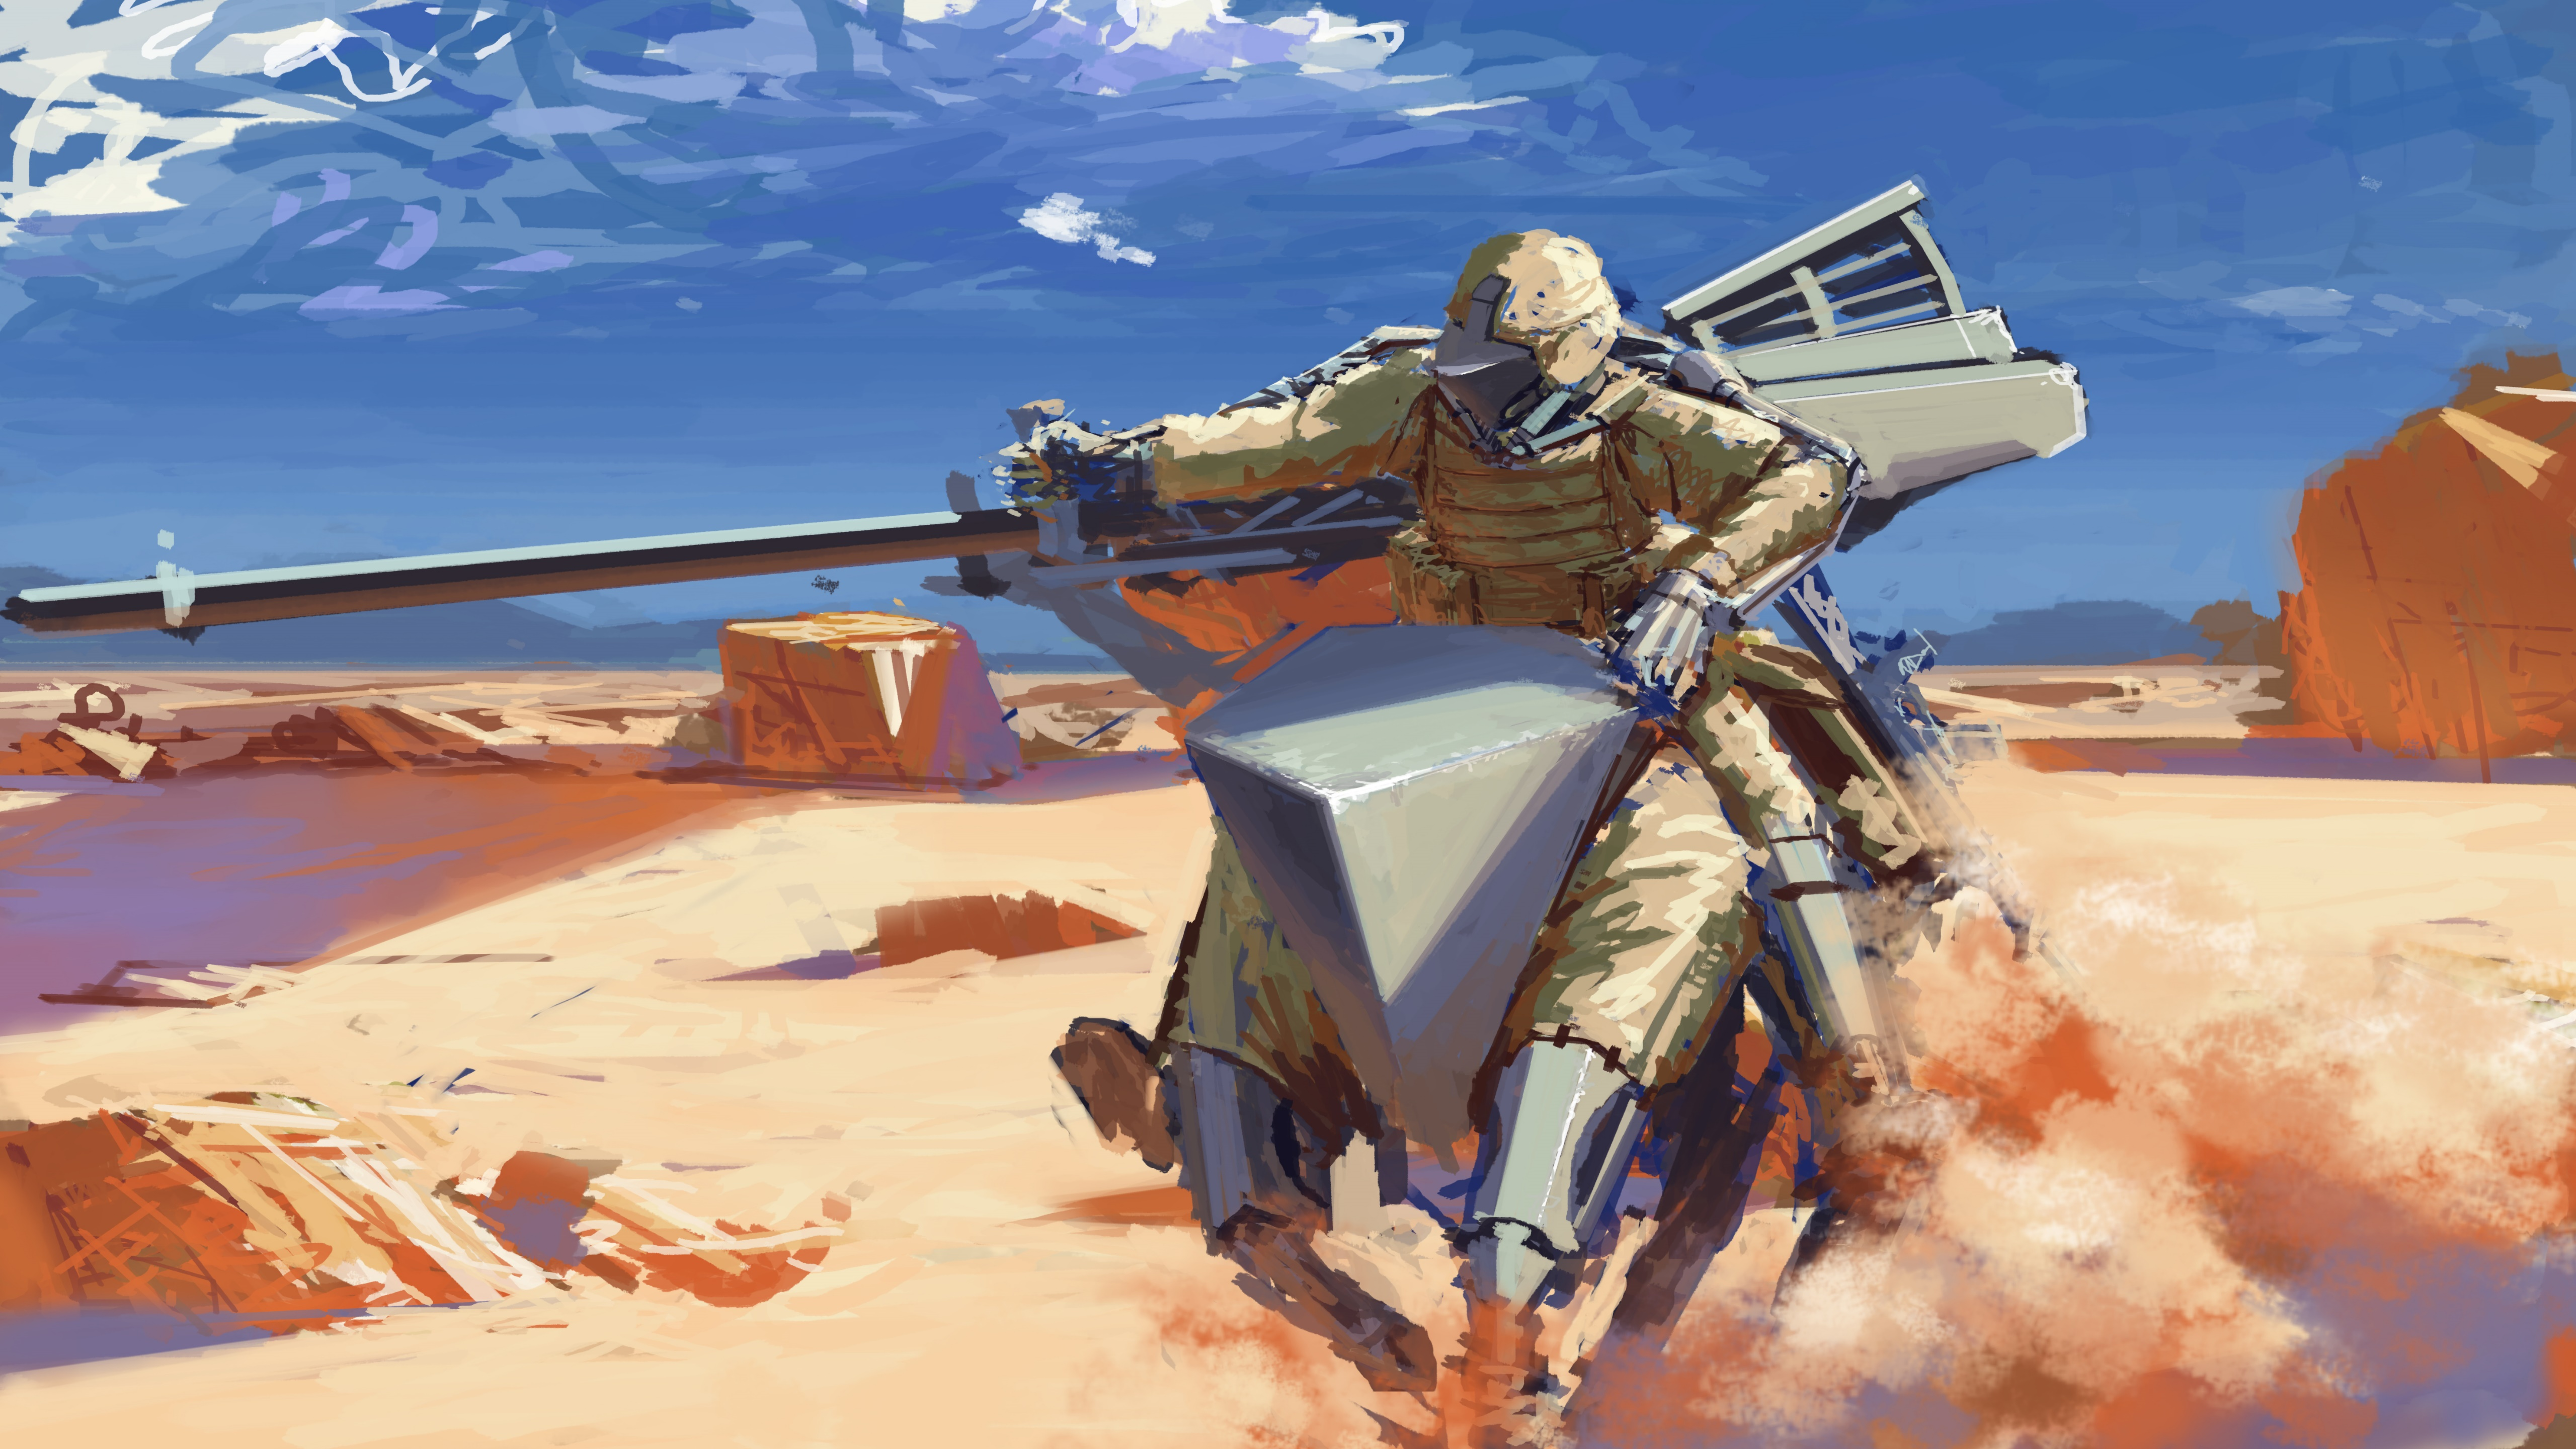 Sci-fi warrior wallpaper